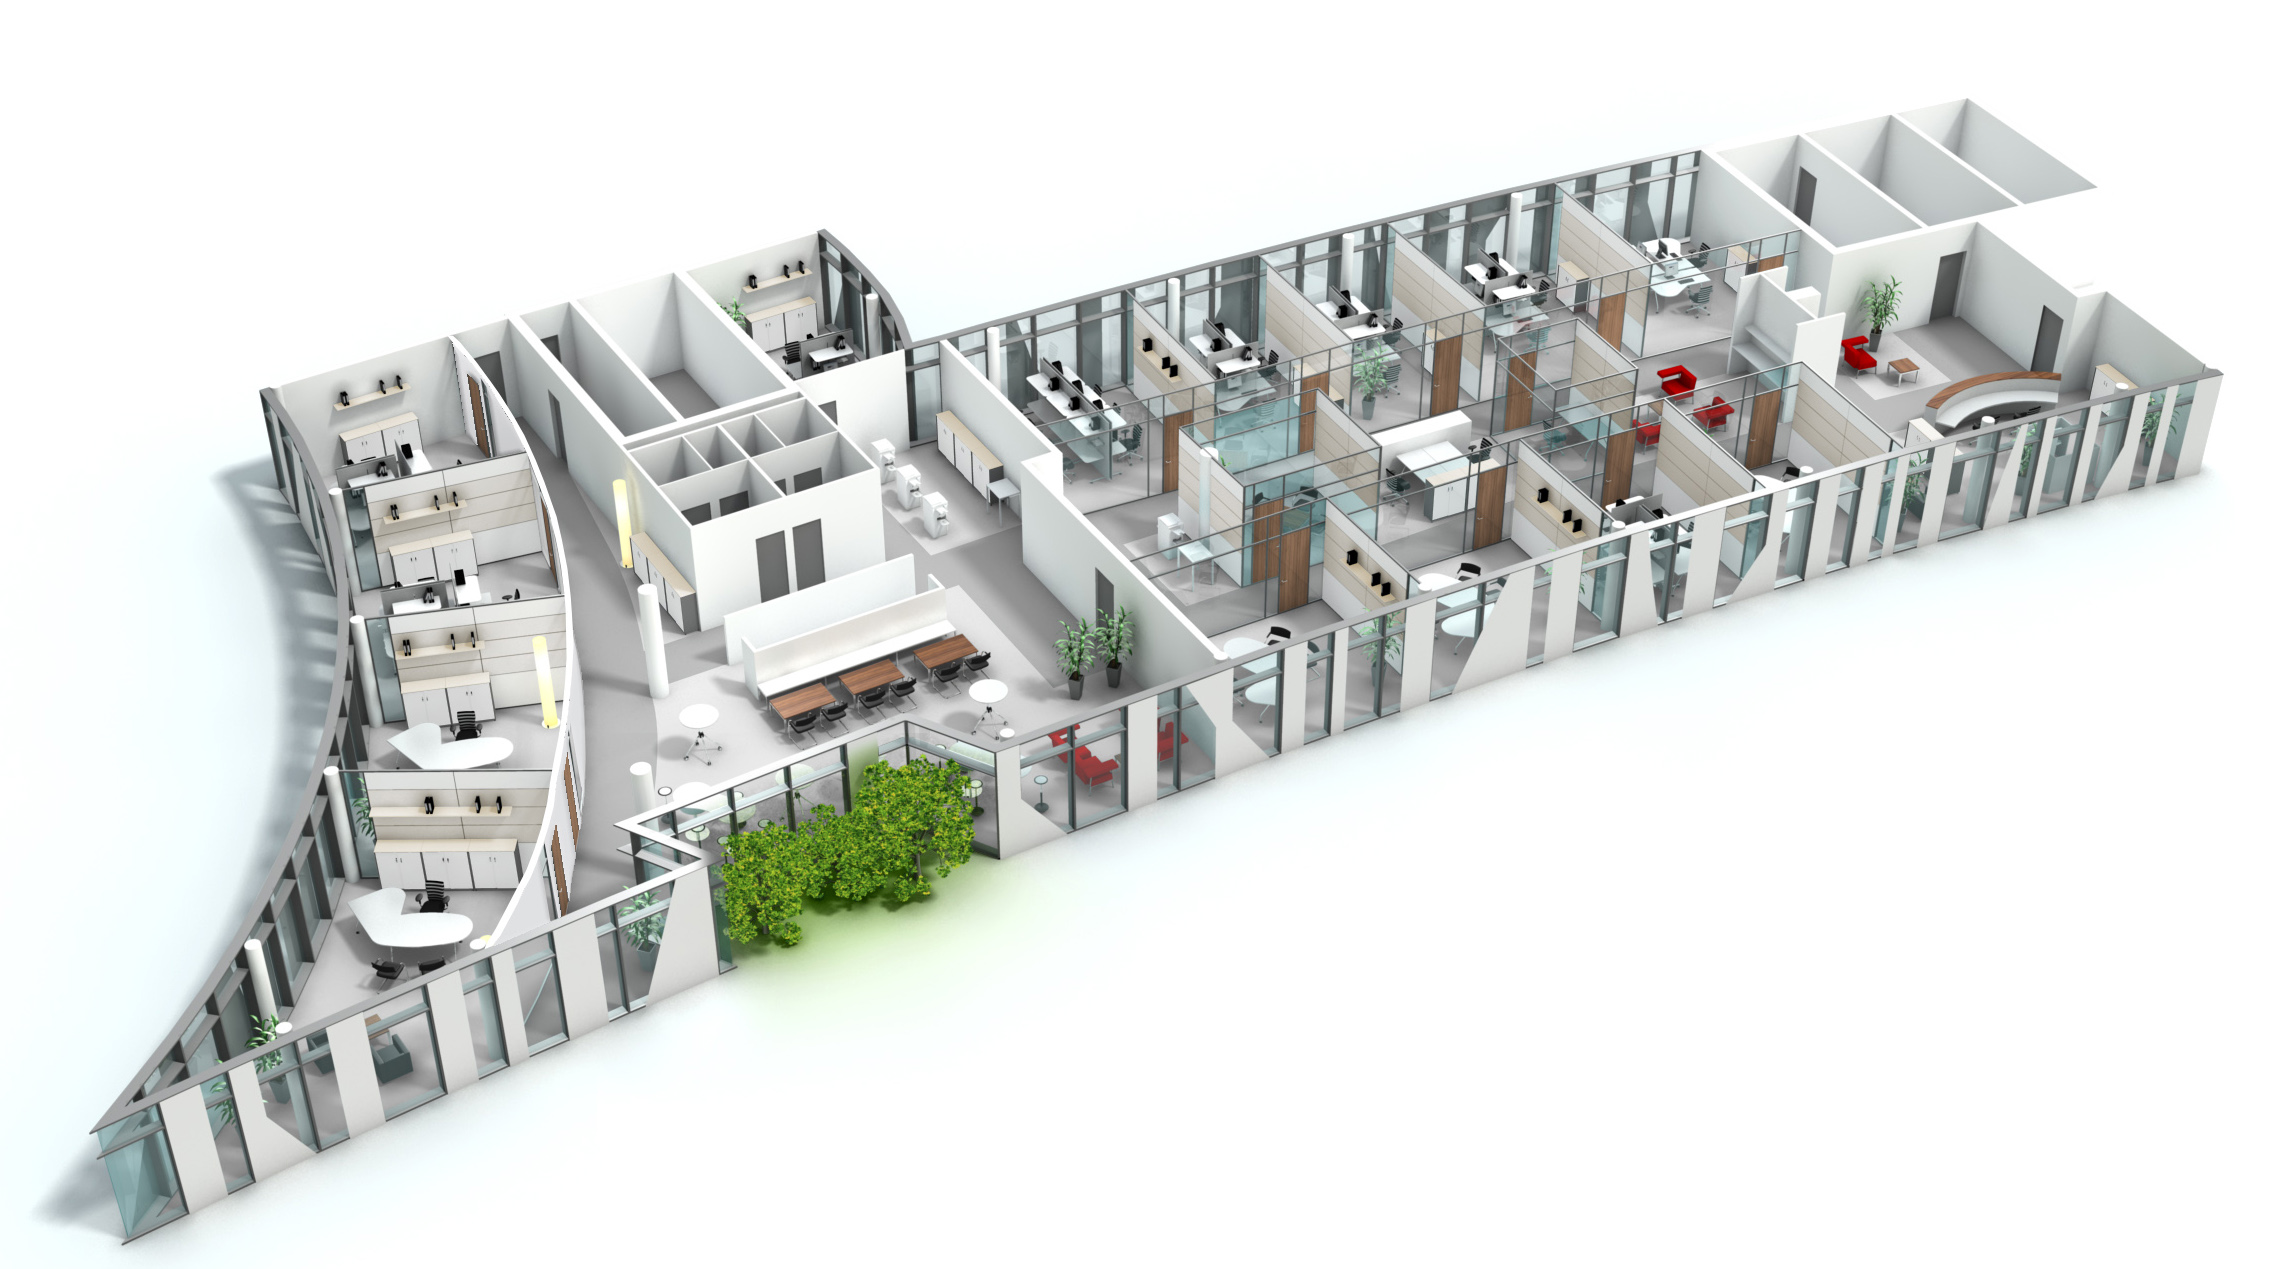 moderne burokonzepte grundriss, der flurfunk, Design ideen